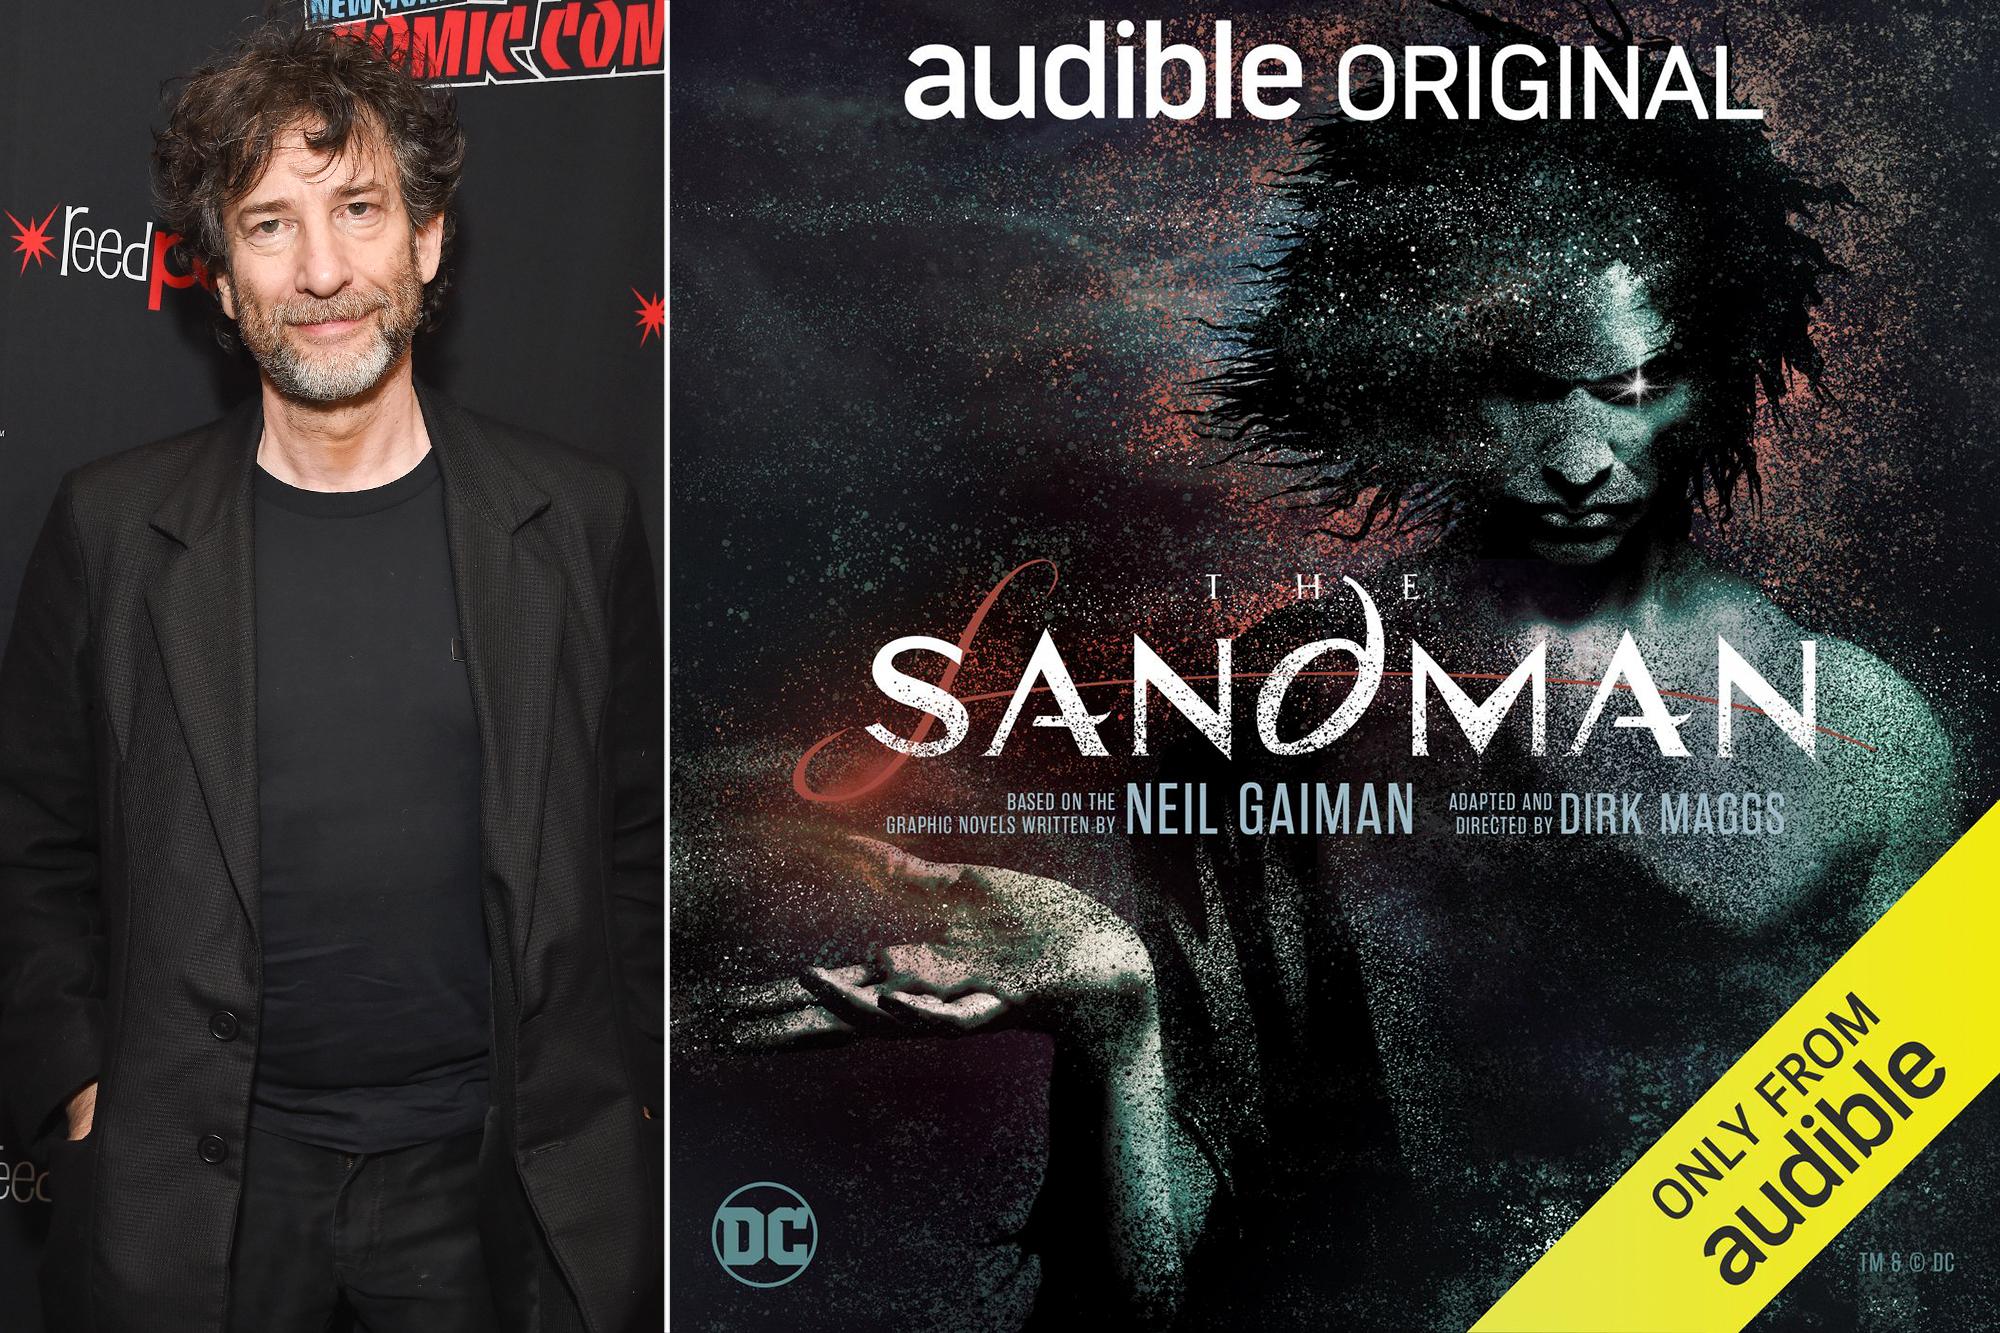 Neil Gaiman, Sandman